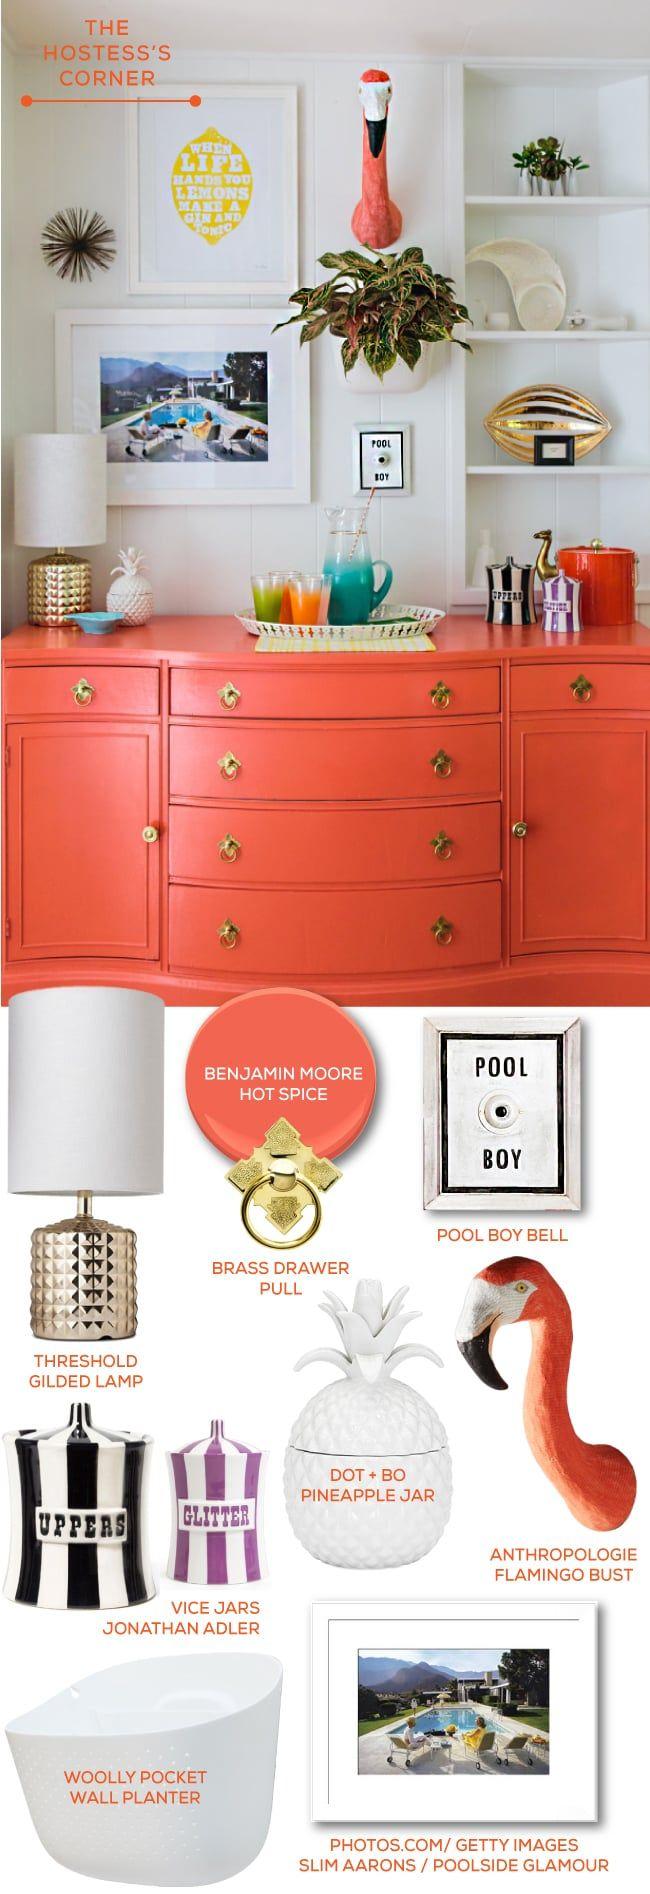 "VIVA LA FOYER:Gray Malin Skinny Dipframed print, loom decor throw  pillows, jonathan adler claude gossip bench set.  THE CHOW HALL: Lex Mod 54"" Lippa Table, Gray Malin Welcome to the Parker,  Loom Decor Color Block Drapes (Ivory + Coral), Dot and Bo Sphere pendant  in gold.  THE HOSTESS'S CORNER:Benjamin Moore Hot Spice Paint, Target Threshold  Gilded Lamp, Lisa GoLightly Ringing Pool Boy Bell, Jonathan Adler Vice Jars , Dot + Bo Kailua Pineapple Jar, Anthropologie Flamingo Bust, Woolly…"